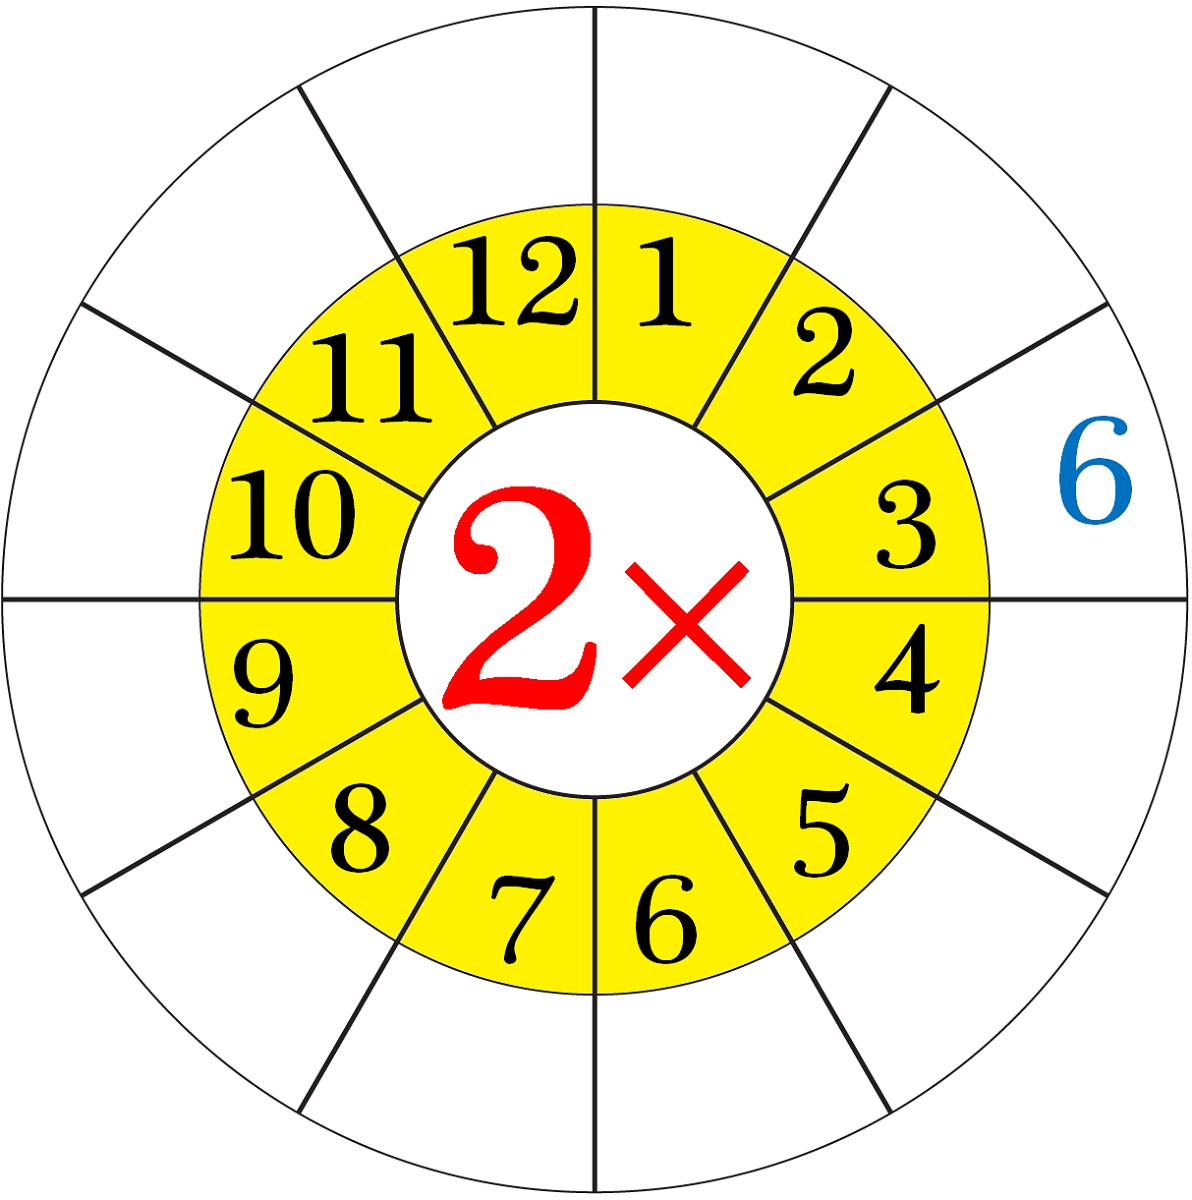 multiply-by-2-worksheet-circle